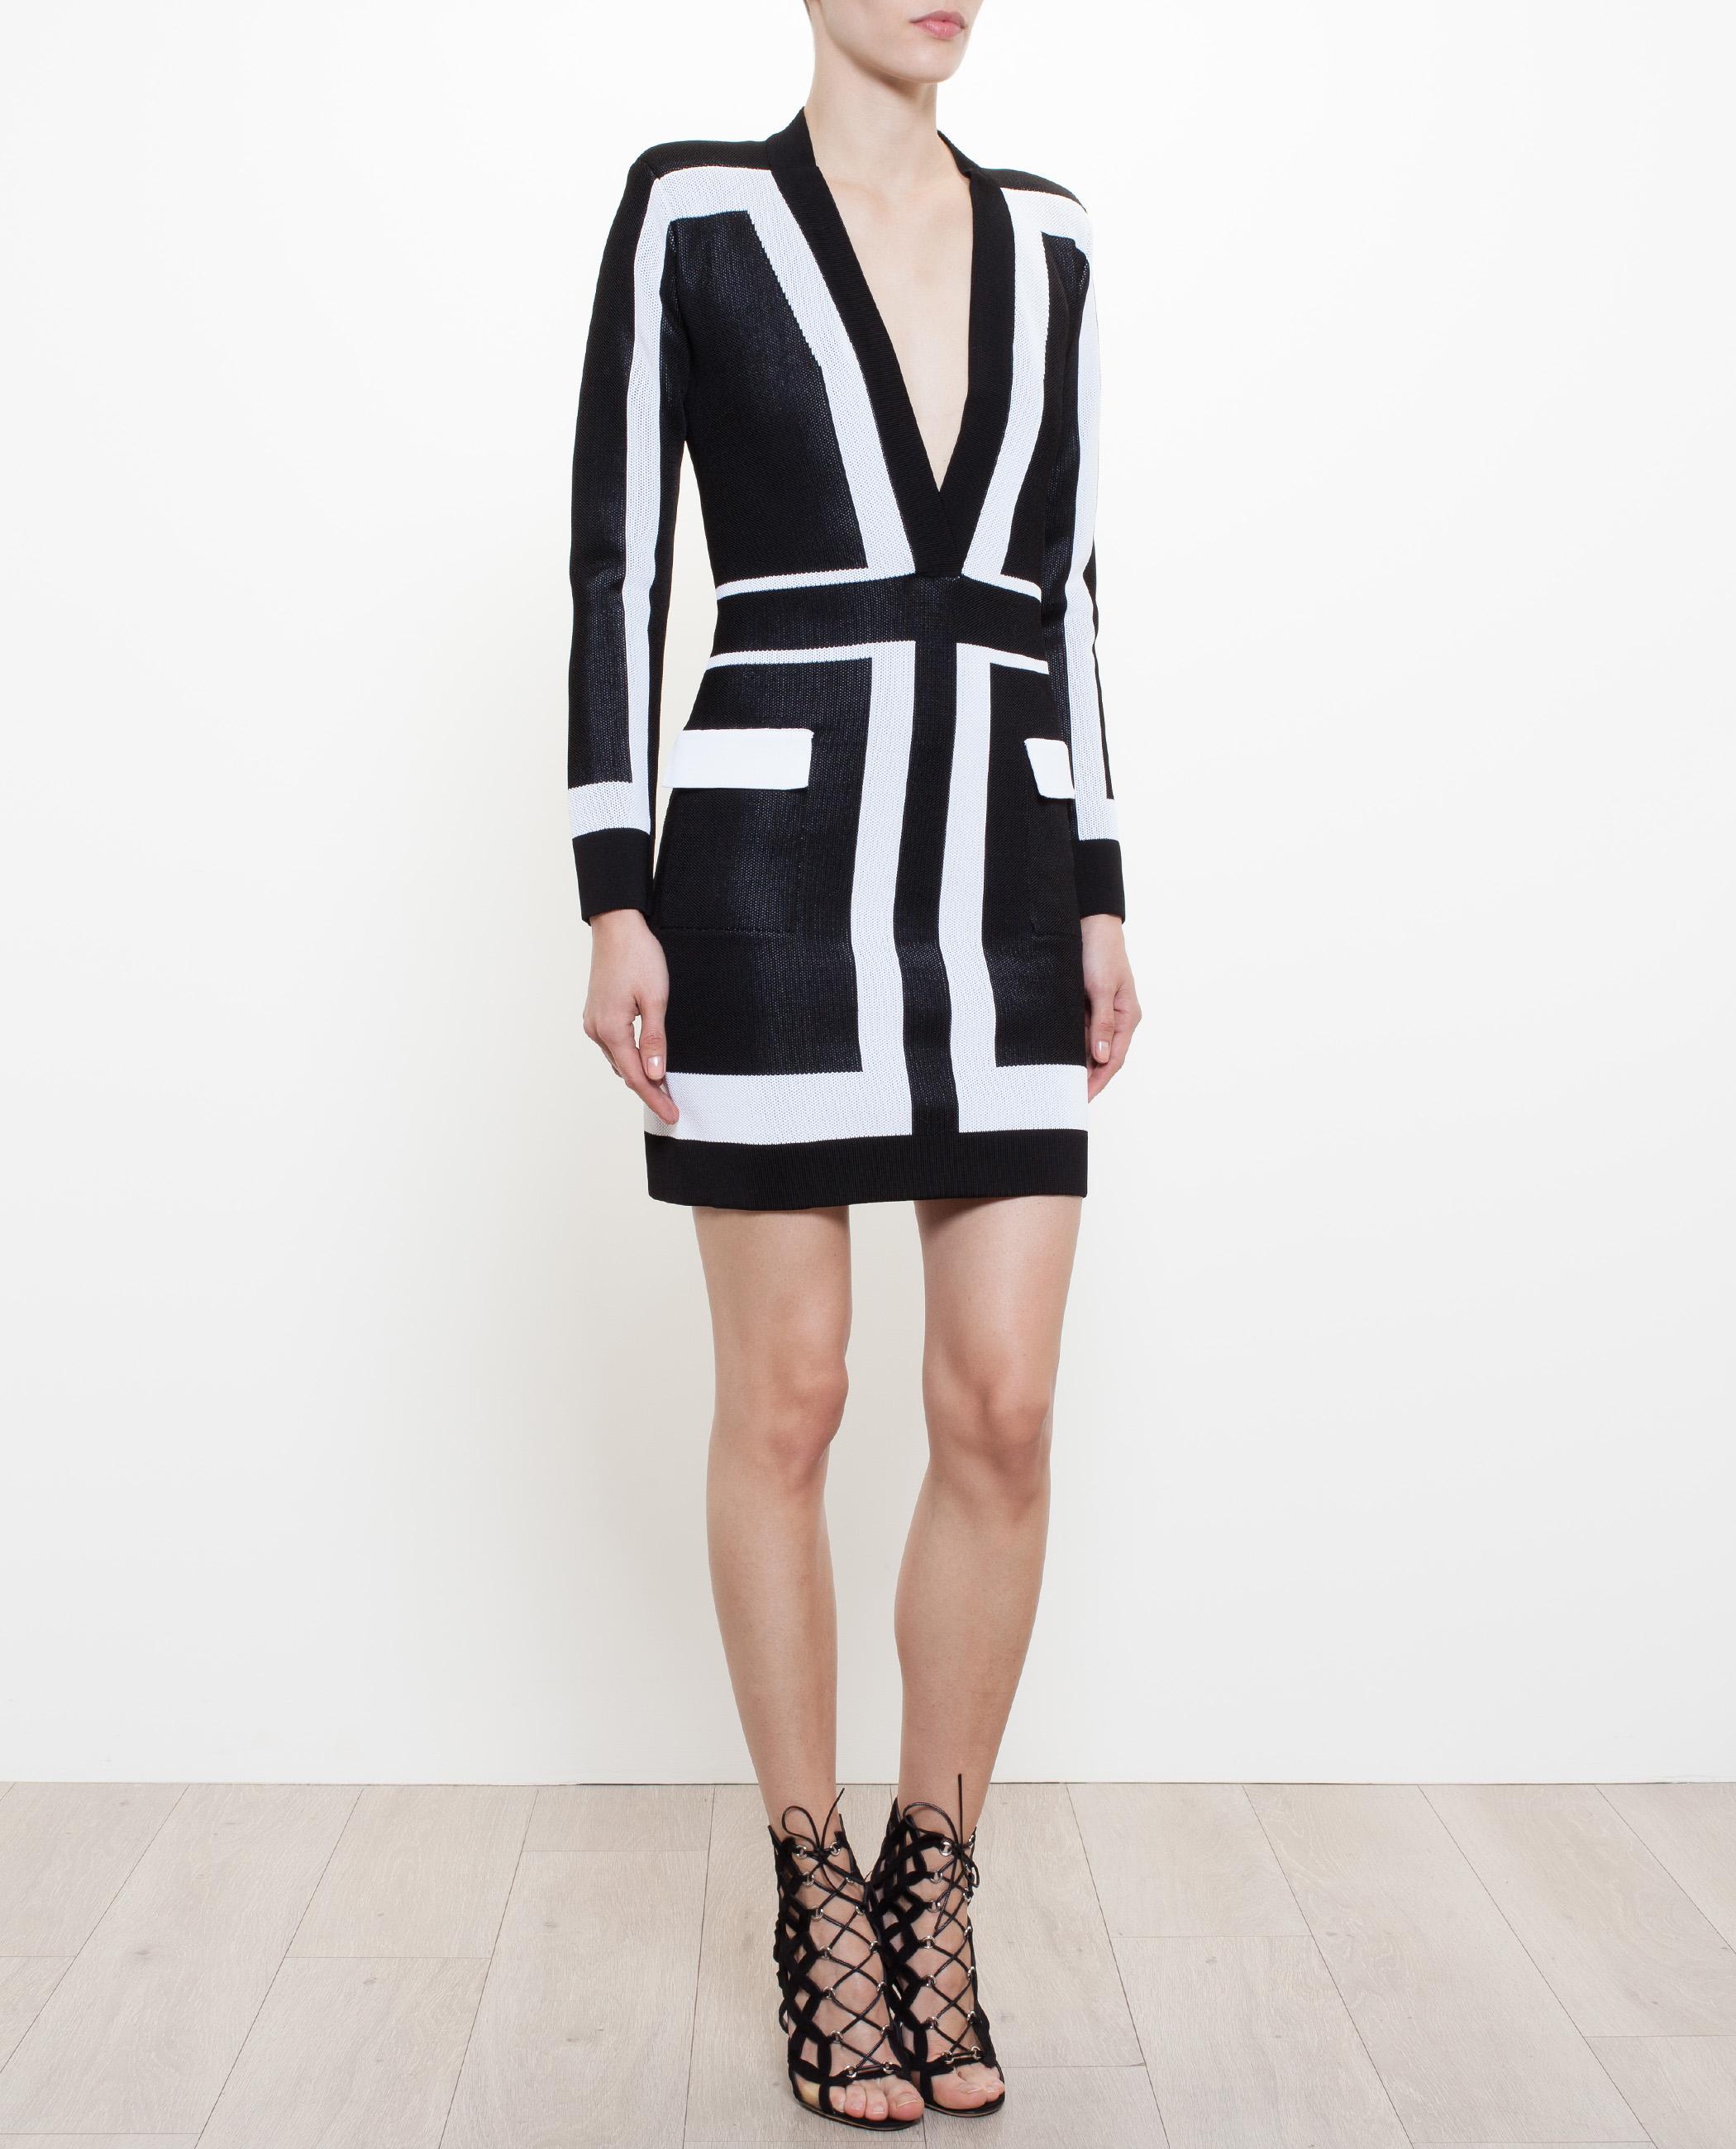 b0a2576018 Balmain Geometric Mesh Dress in Black - Lyst